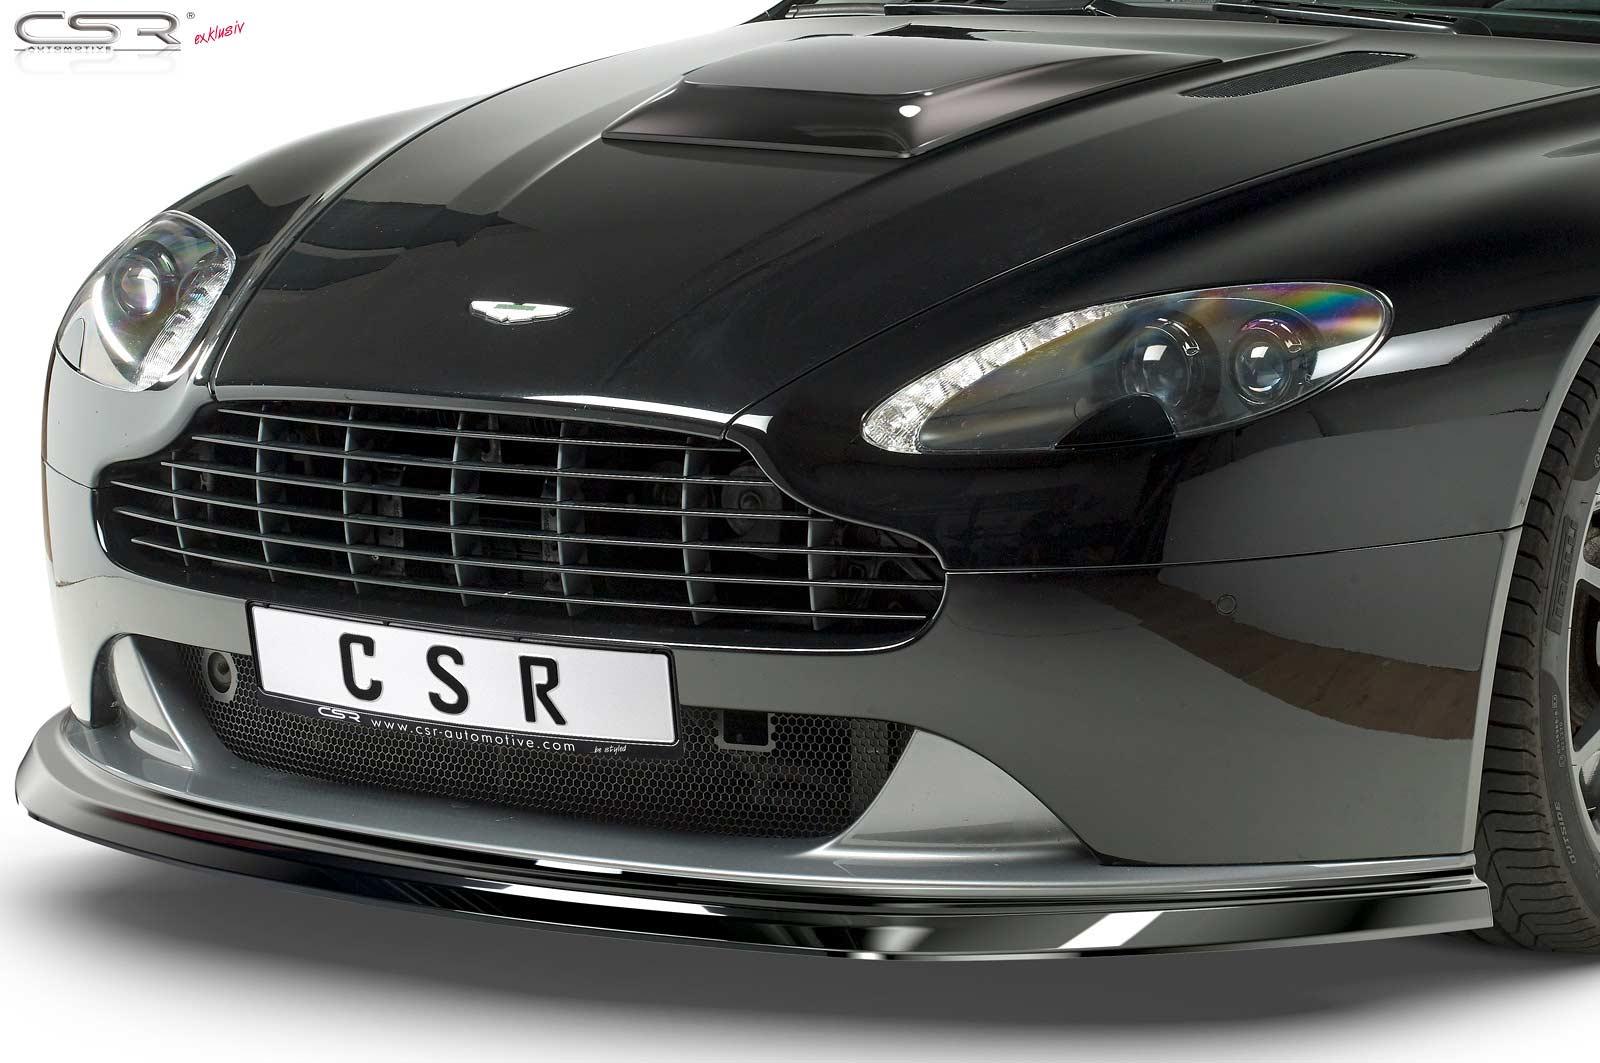 Cupspoilerlip Black Glossy For Aston Martin Vantage Csl392 G